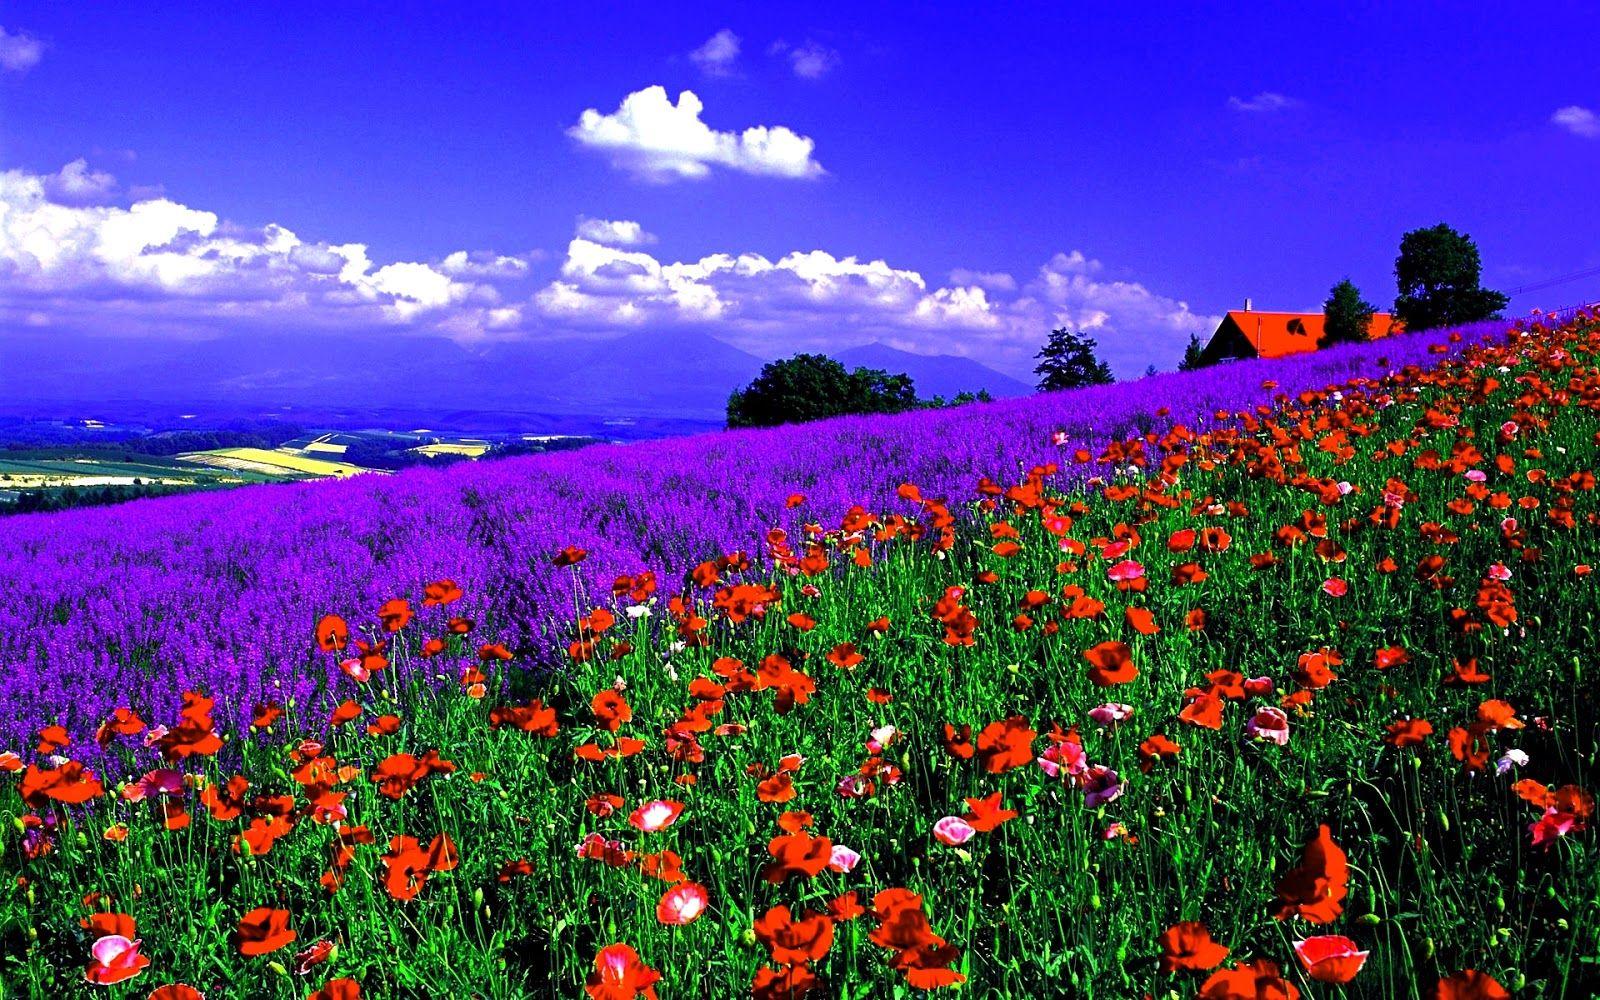 Paisajes De Flores De Flores Flores De Colores Imagenes